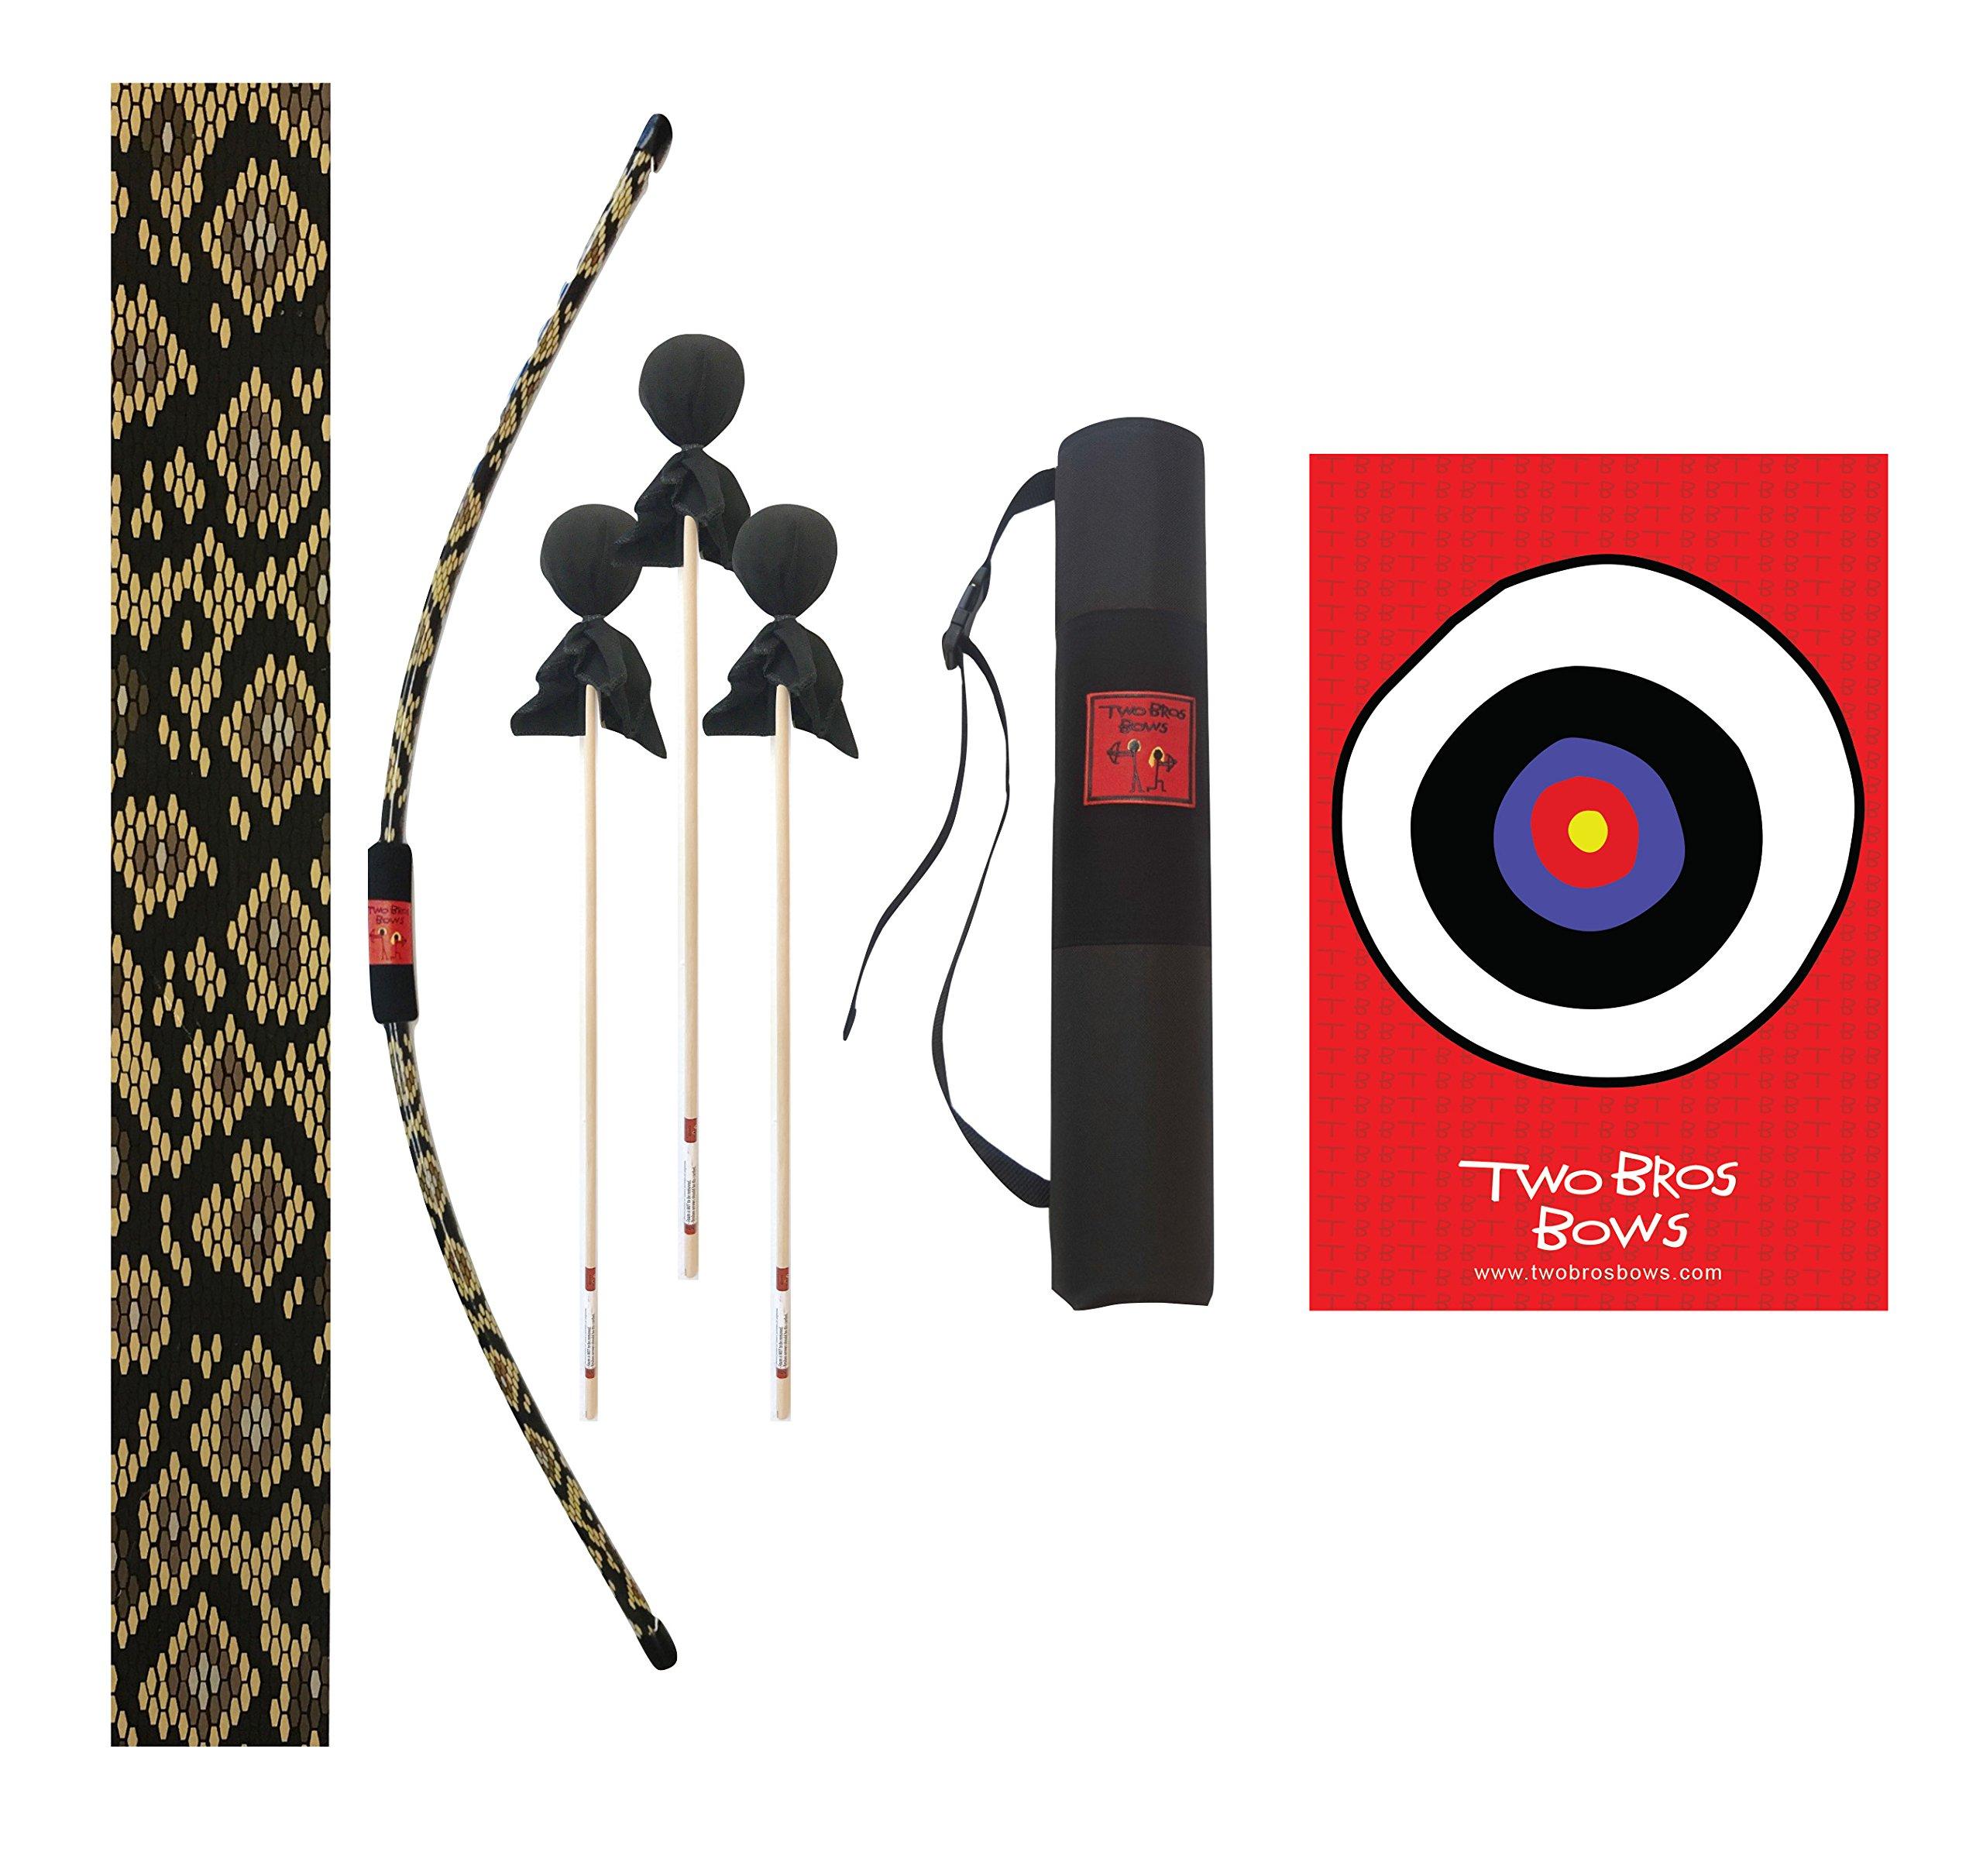 Two Bros Bows Python Archery Combo Set